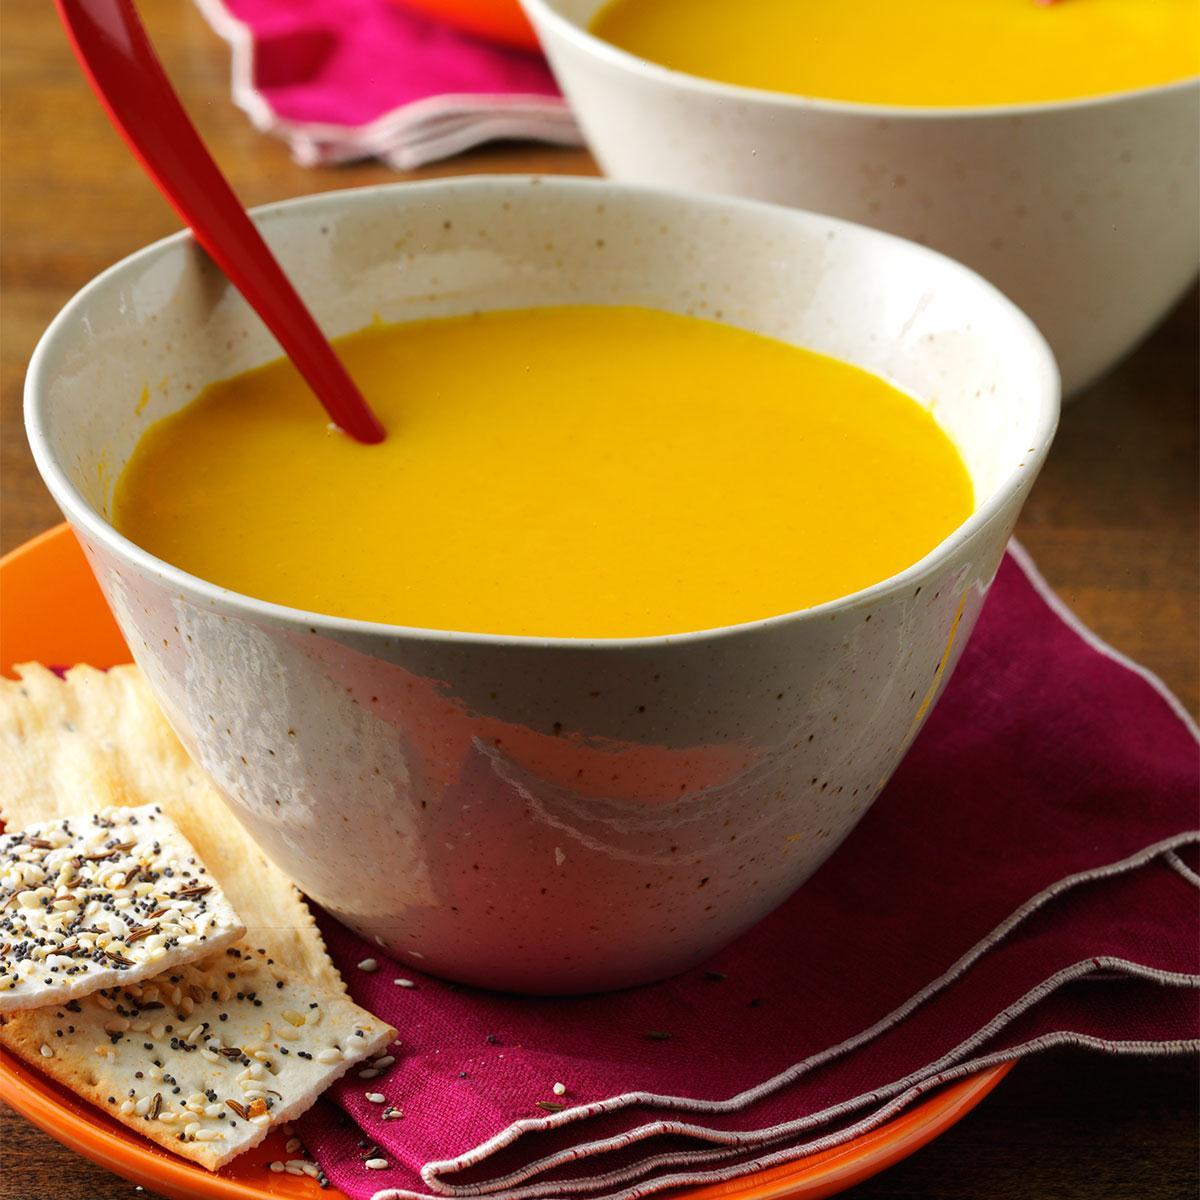 Apple Squash Soup. #soups #pumpkin #frenchfood https://t.co/RXjG6pNPfy https://t.co/l0j67b5J5s